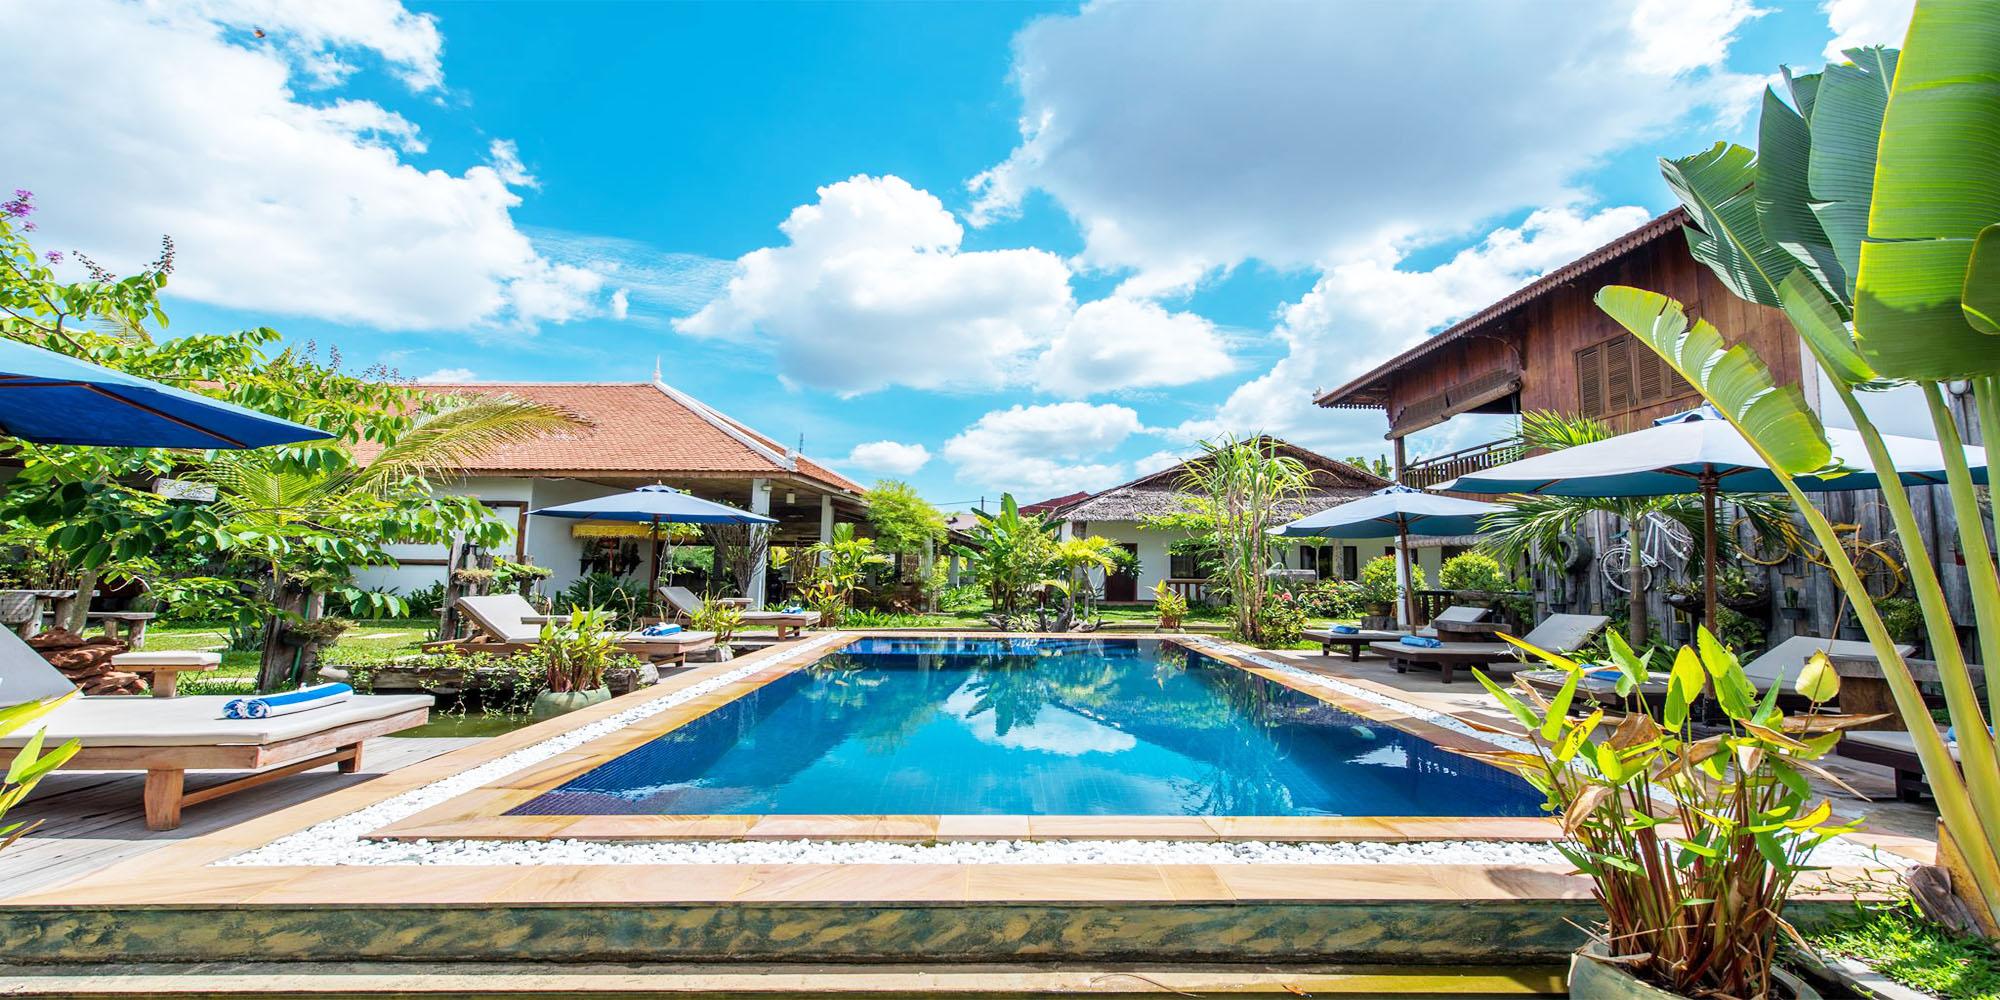 Amazing and Exquisite Decor 10 – Bedroom Bungalow for Rent in Siem Reap – Svay Dangkum [POOL]